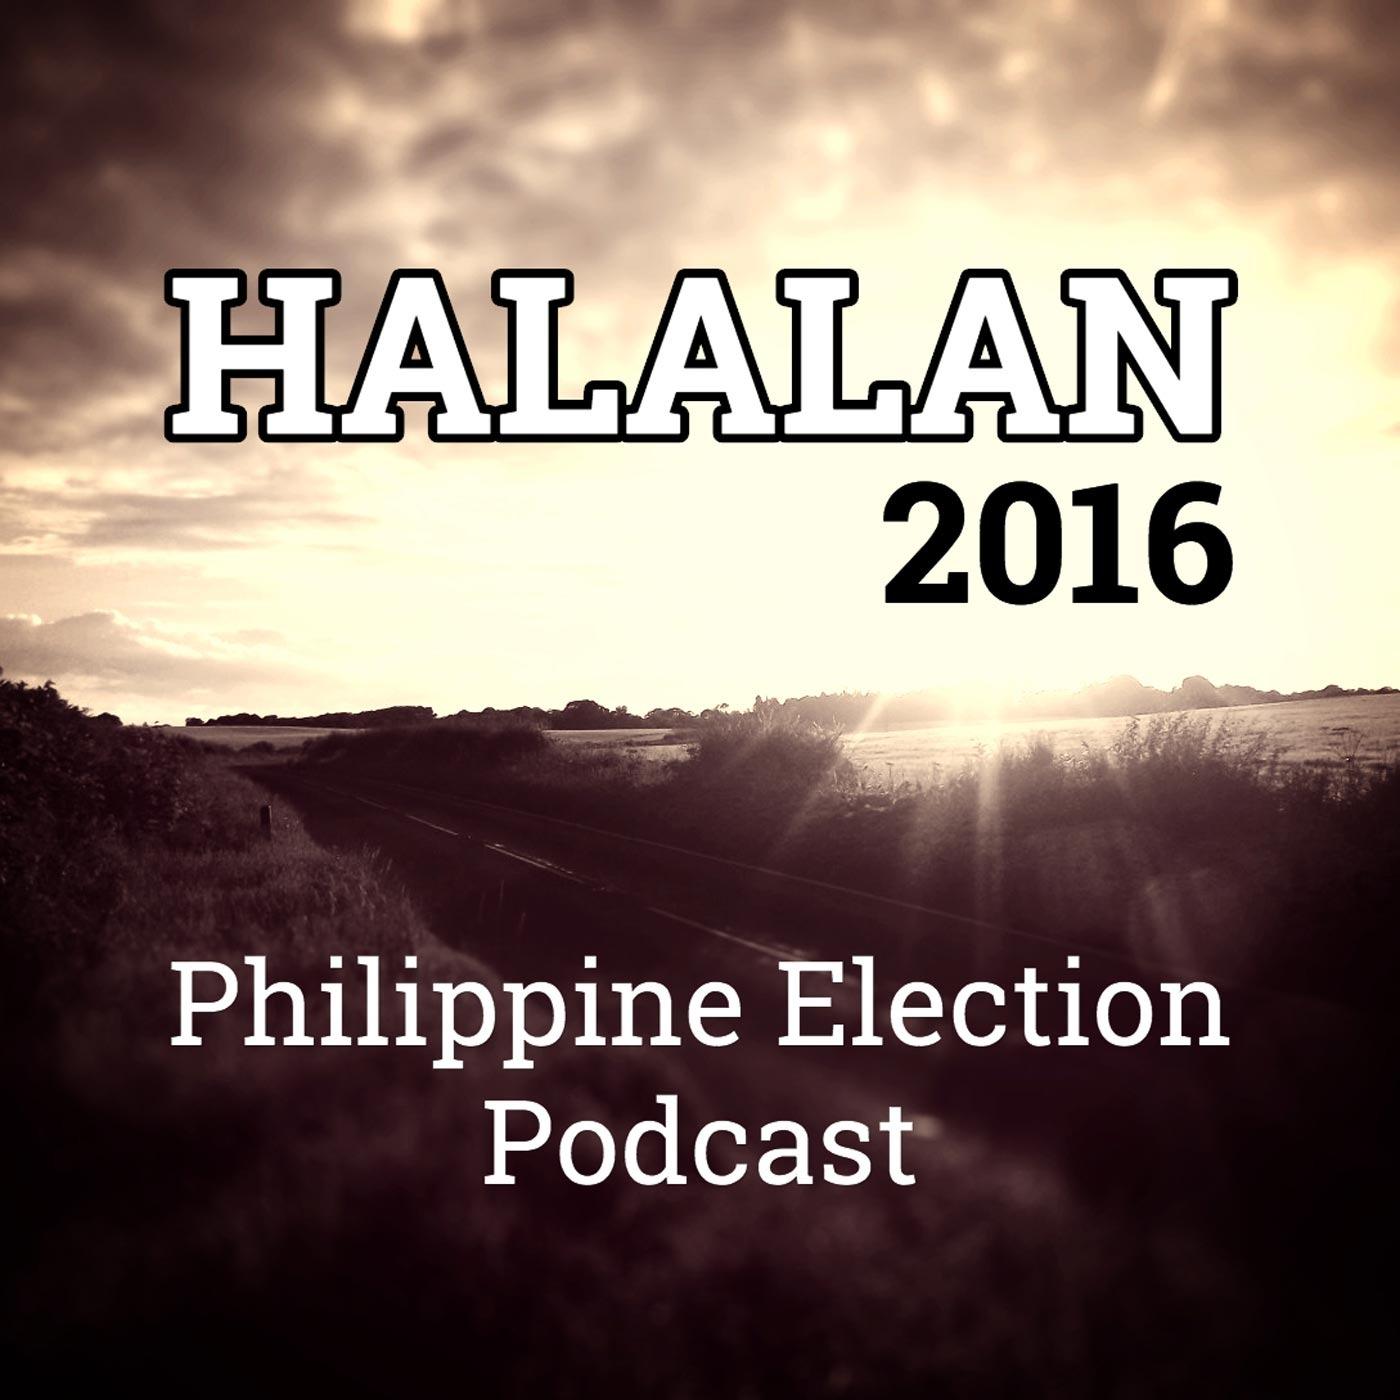 Halalan 2016 - Philippine Election Coverage